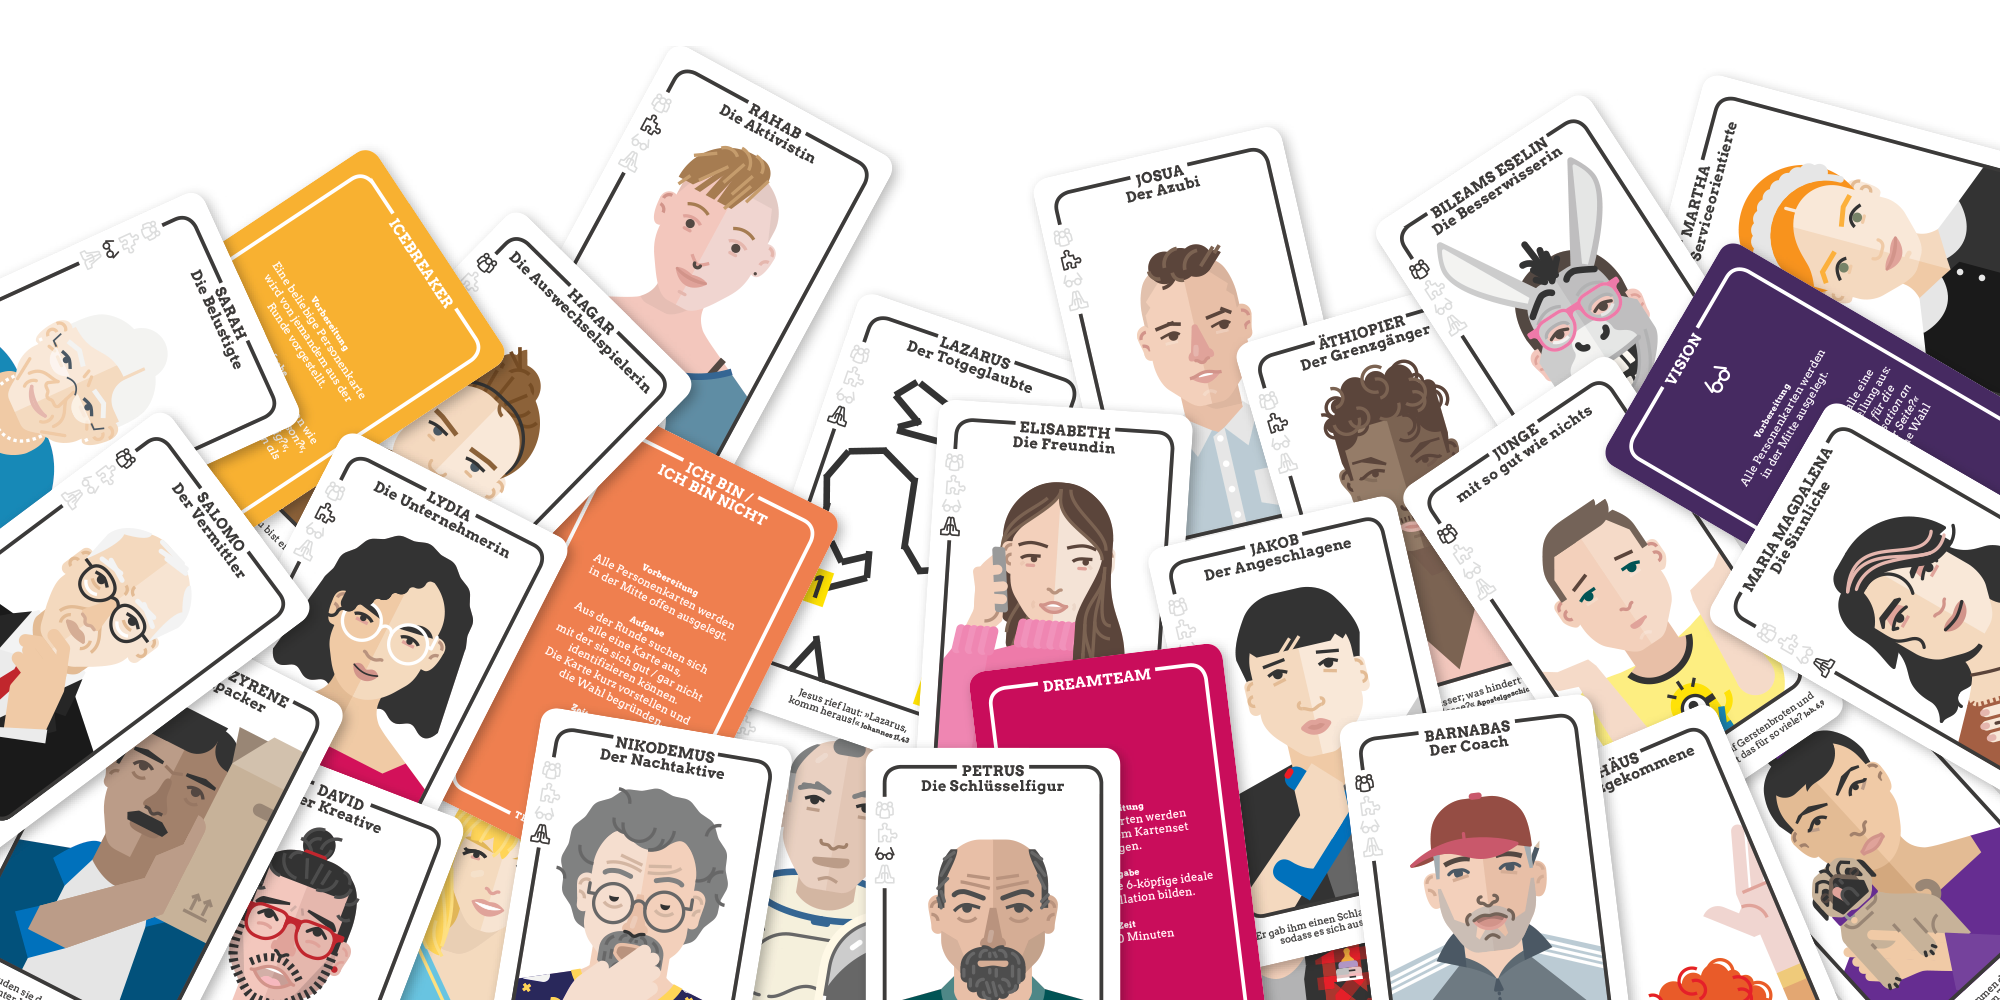 Team Unser, godnews, Teamentwicklung, Kartenset, Übersicht, Teaminspiration, biblische Charakterköpfe, Toolbox, Vertiefung